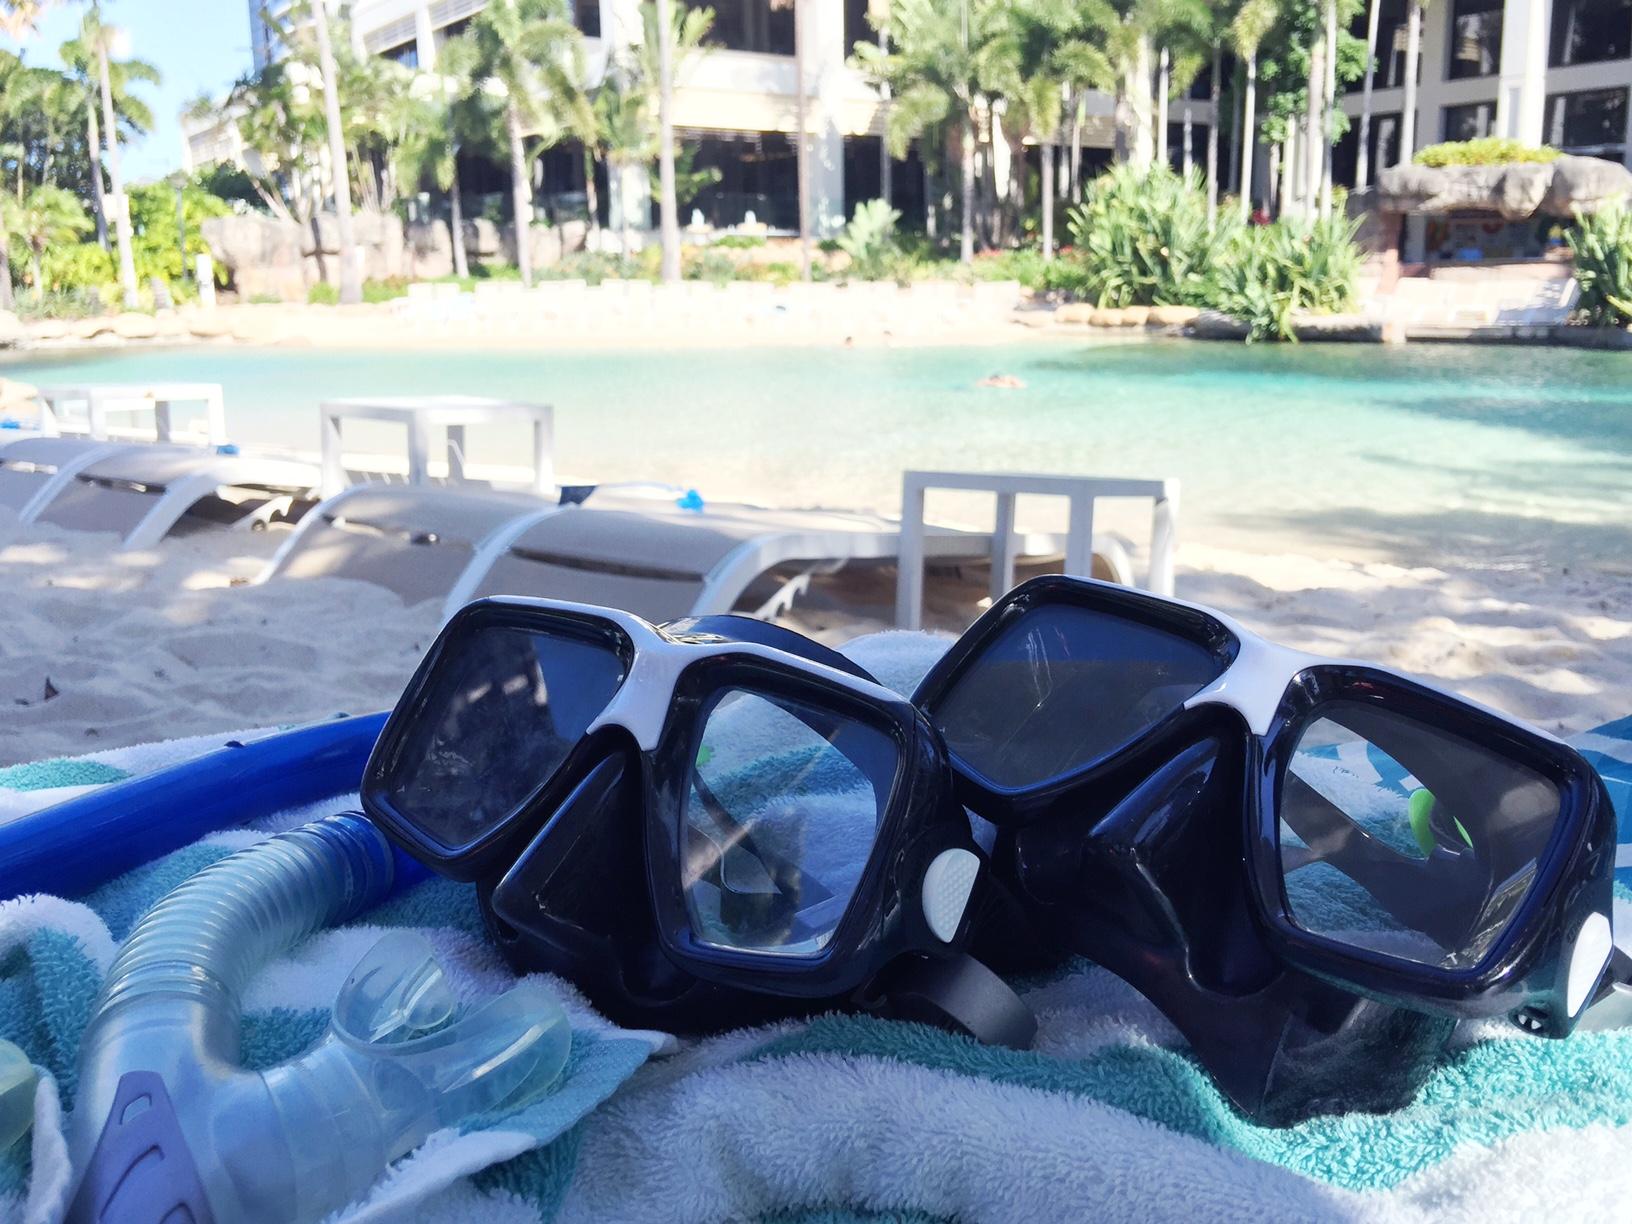 surfers paradise marriott resort and spa gold coast australia beach honeymoon romantic couples holiday luxury vacation hotel review marriott pool snorkeling beach cabana